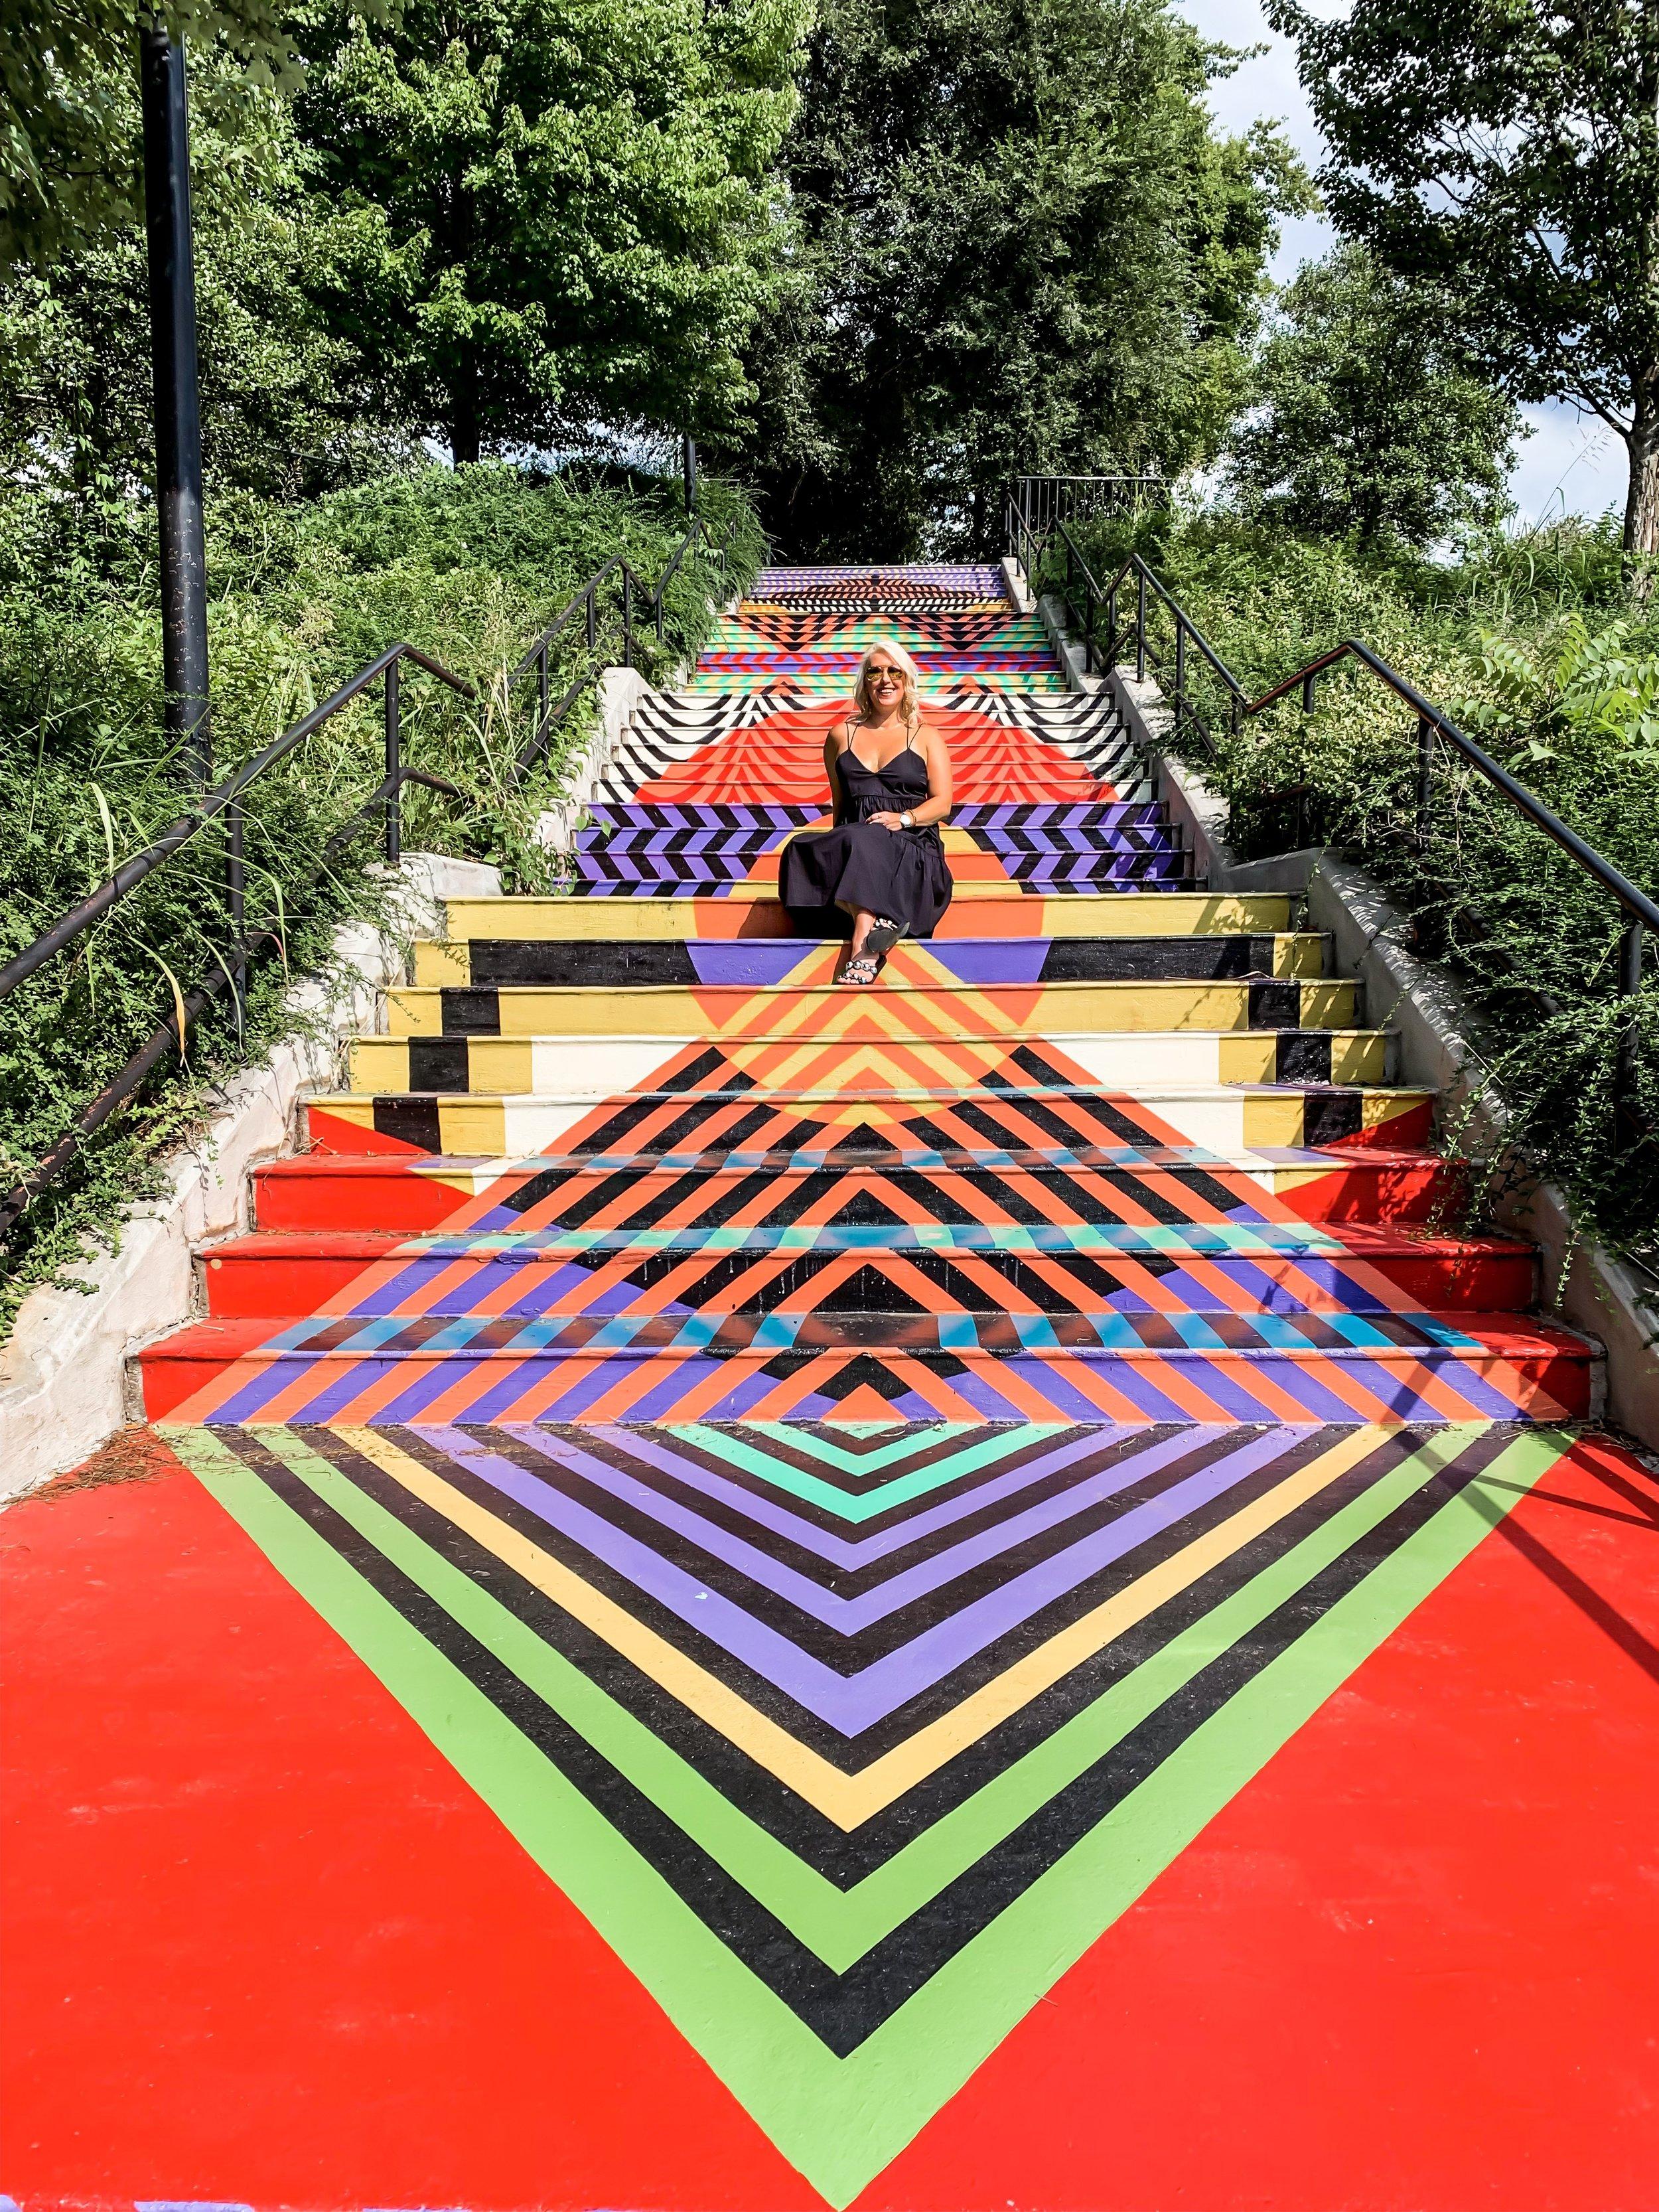 Weaving Rainbow Mountain: Aren't Those Vivid Colors Captivating?